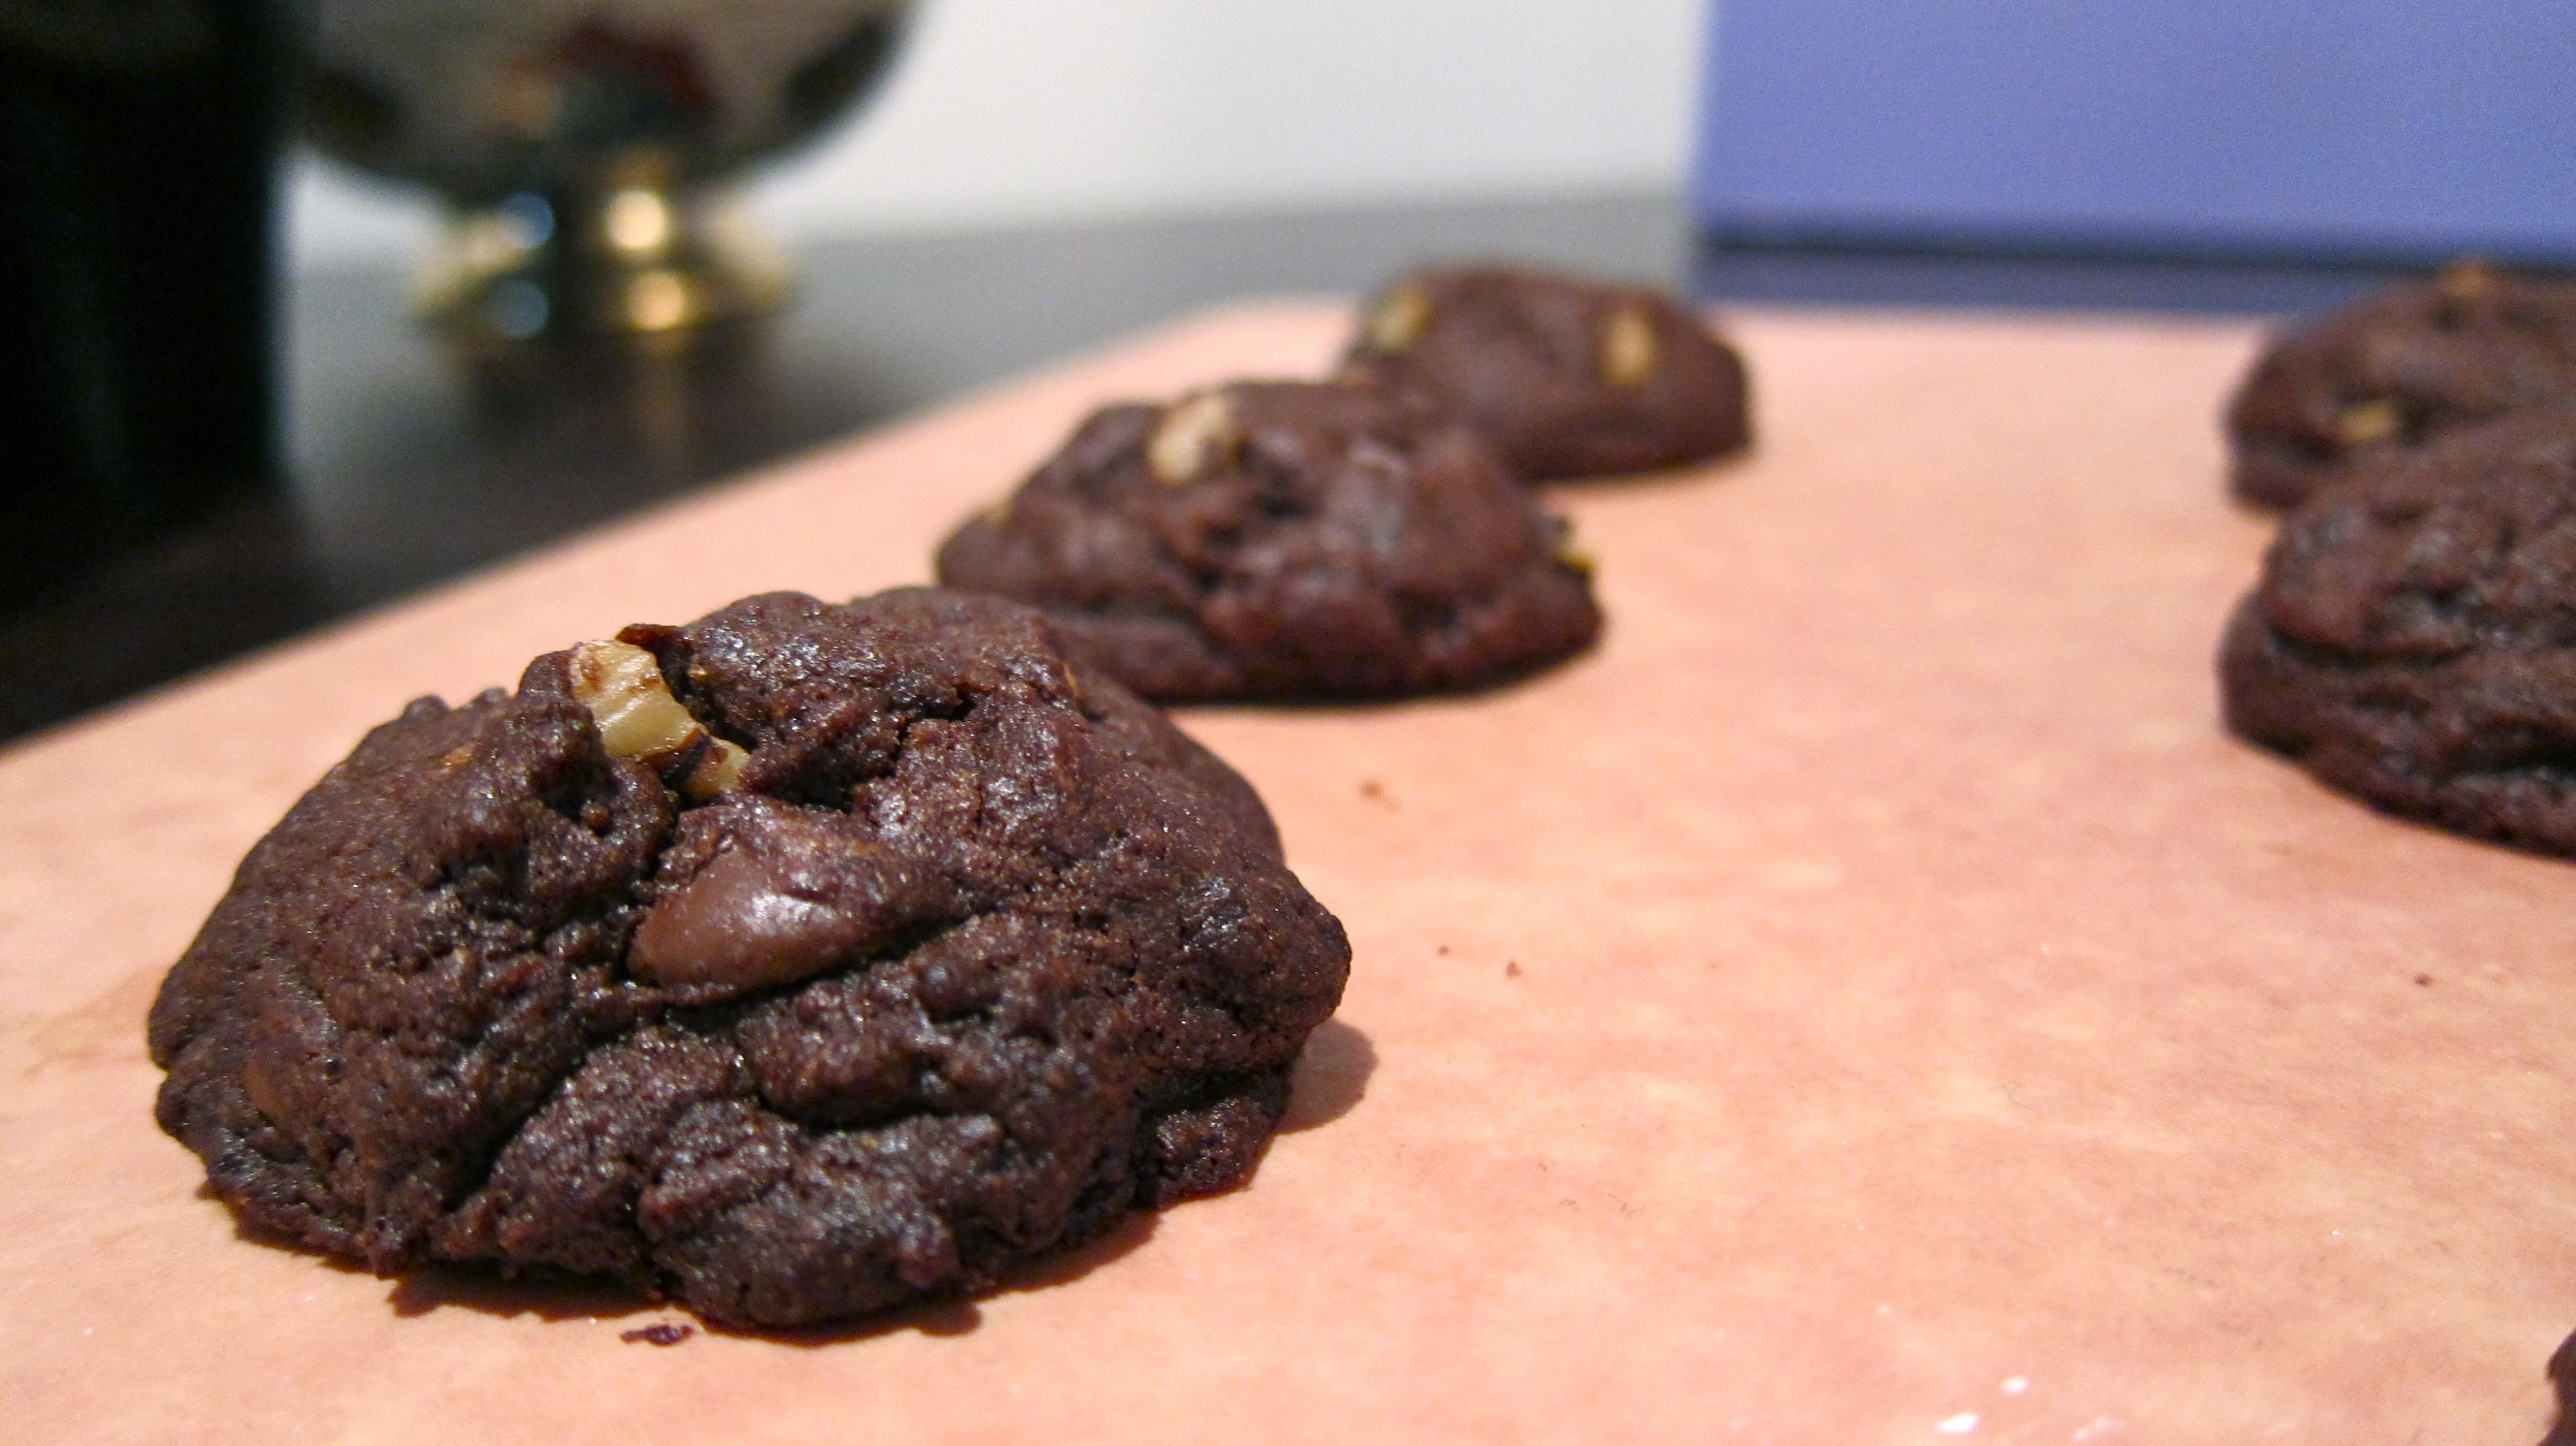 Famous amos cookies recipe malaysia - Food baskets recipes